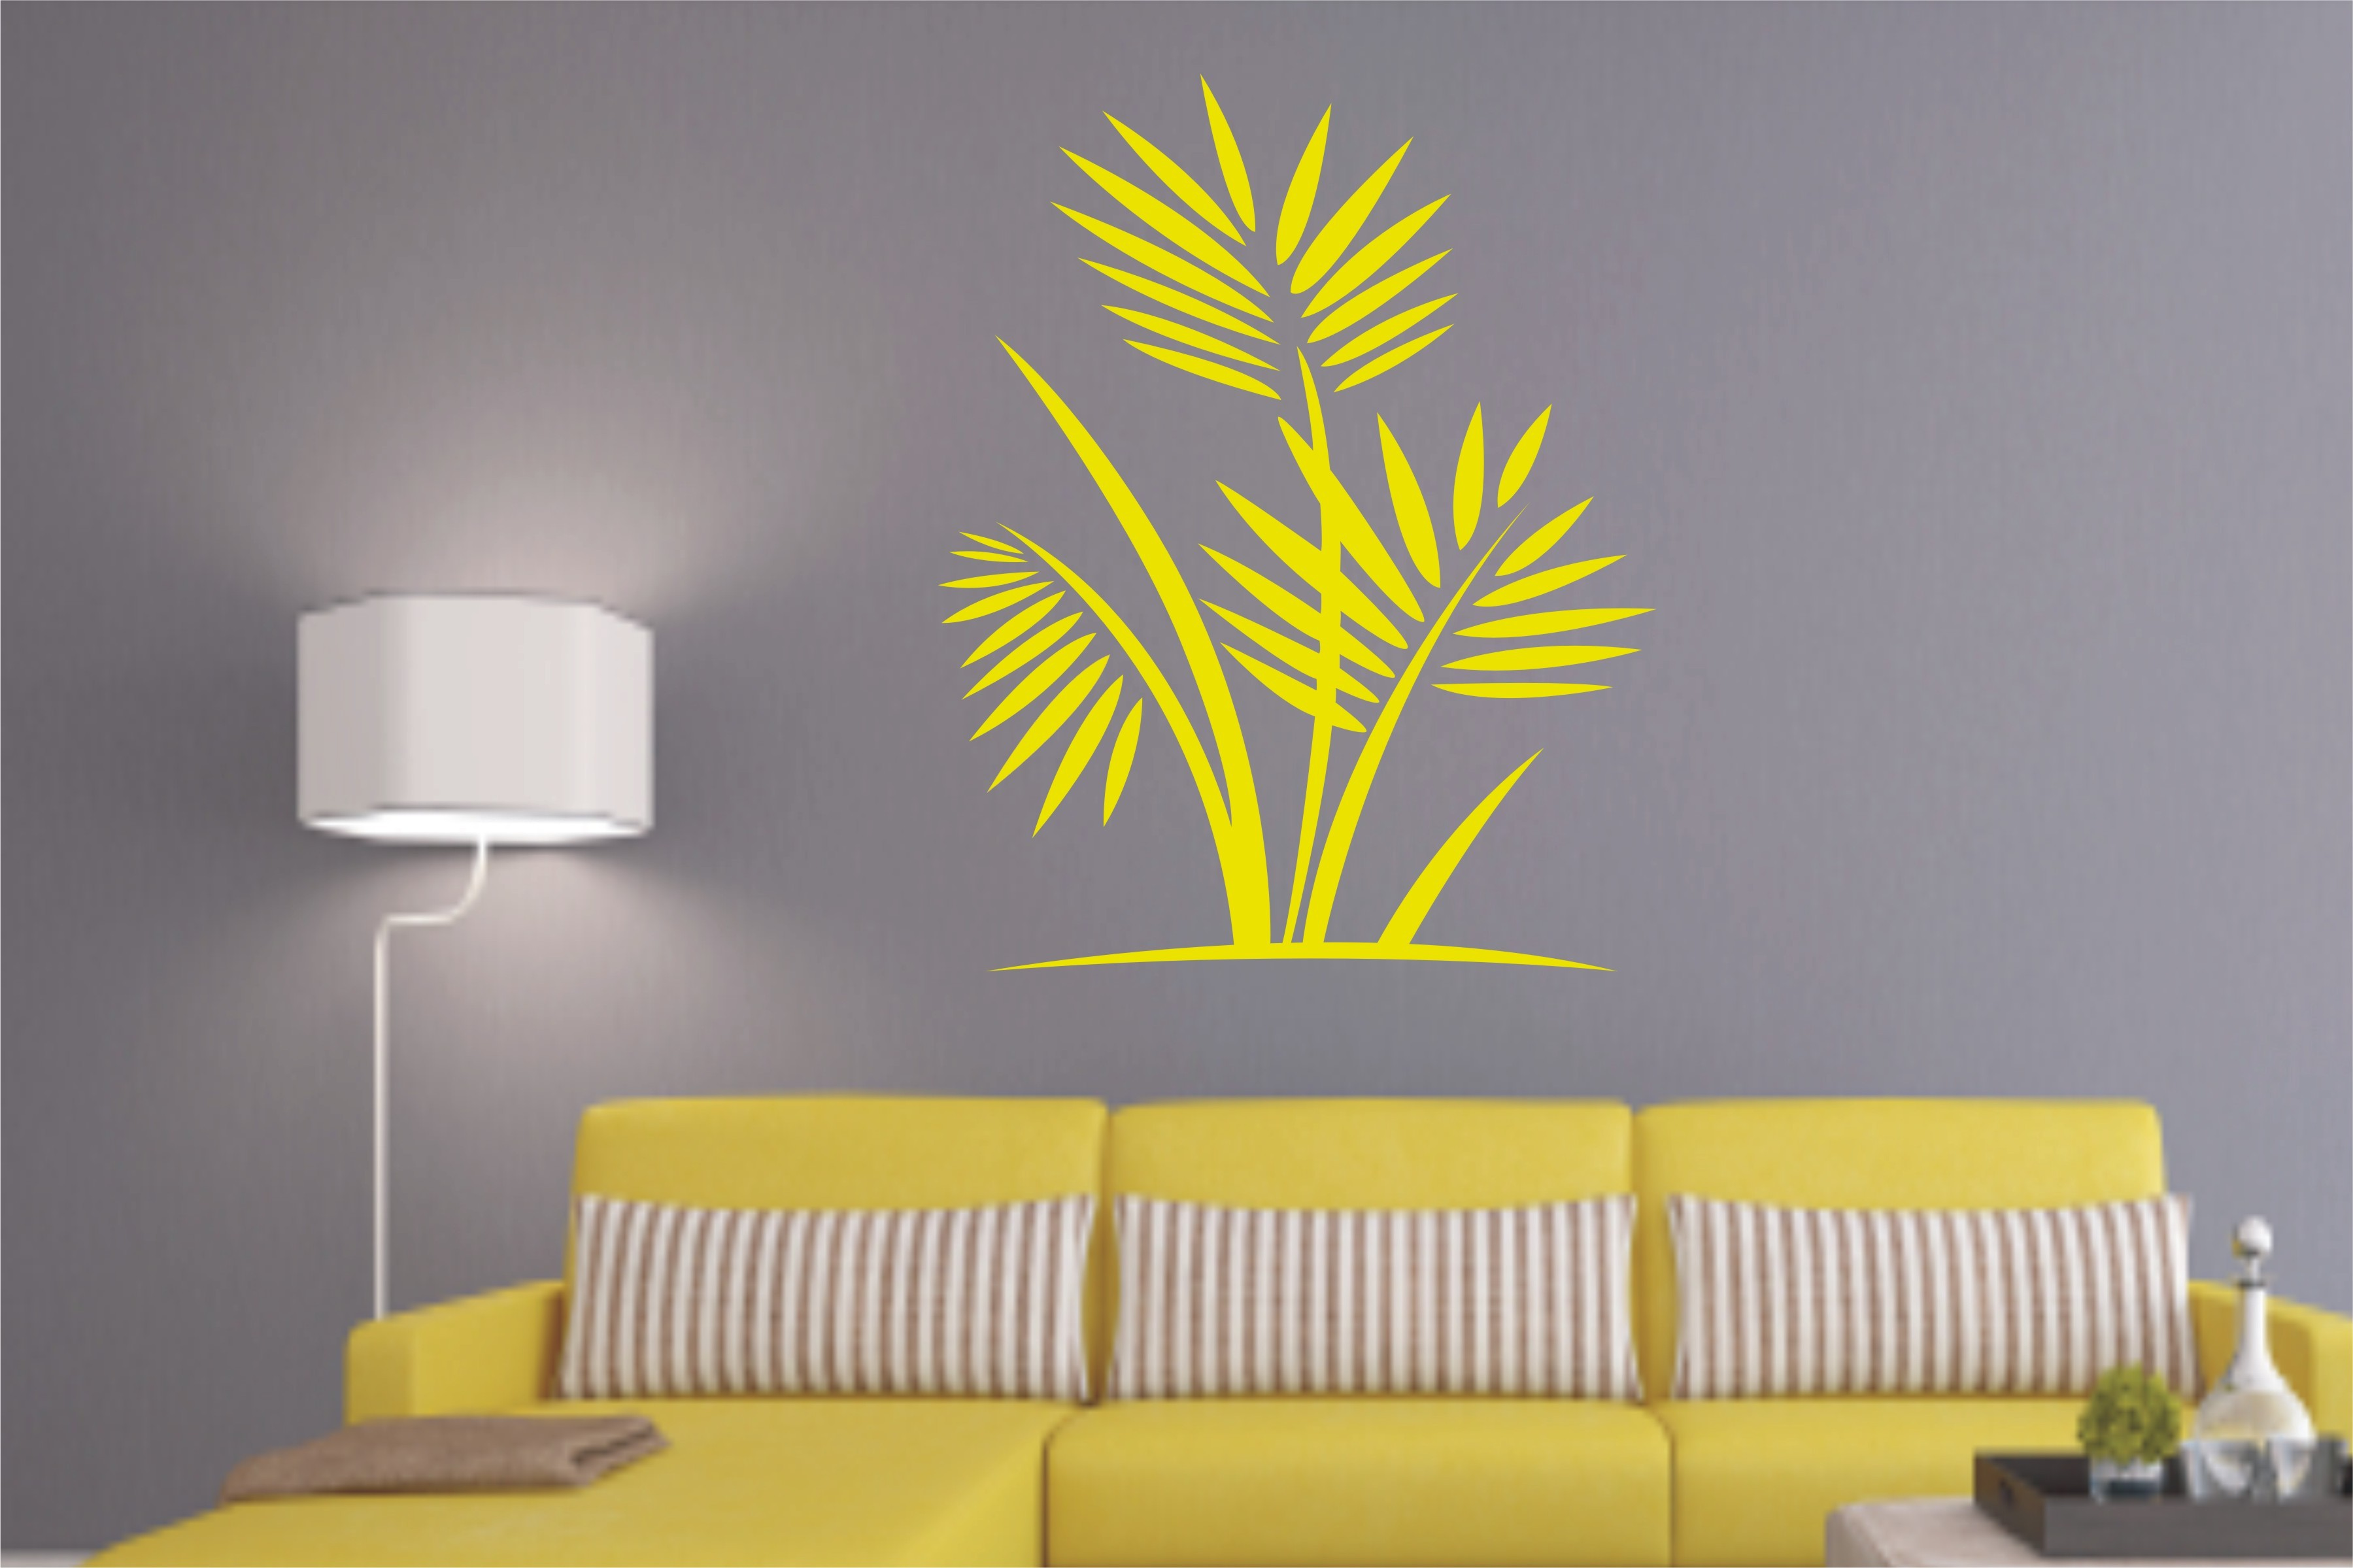 Fantastic Paper Mache Wall Decor Images - The Wall Art Decorations ...